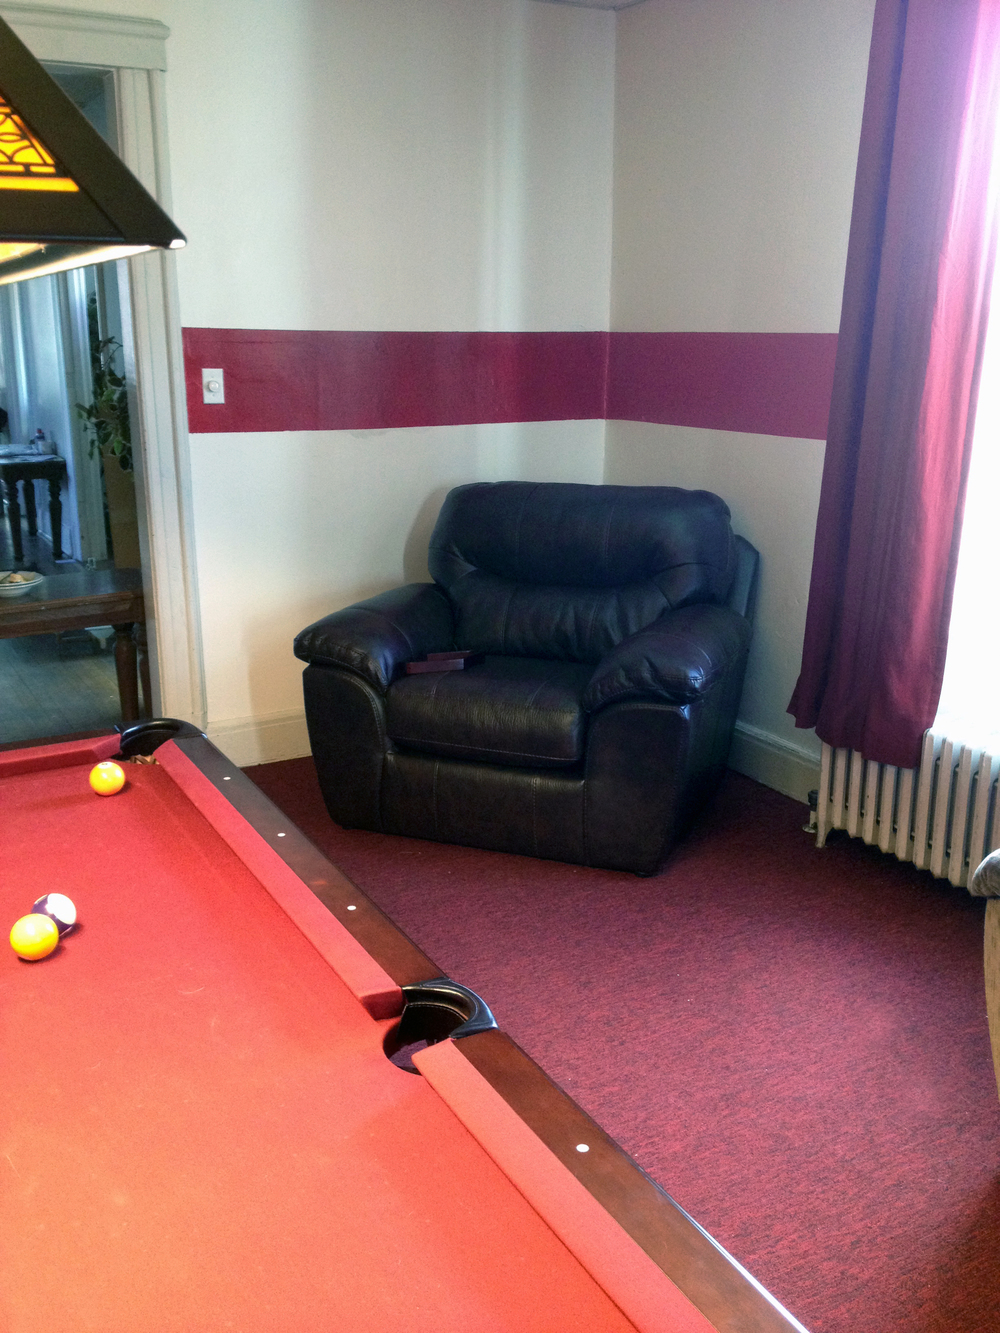 2013 Alumni Work Weekend - Pool Room Project New Chair